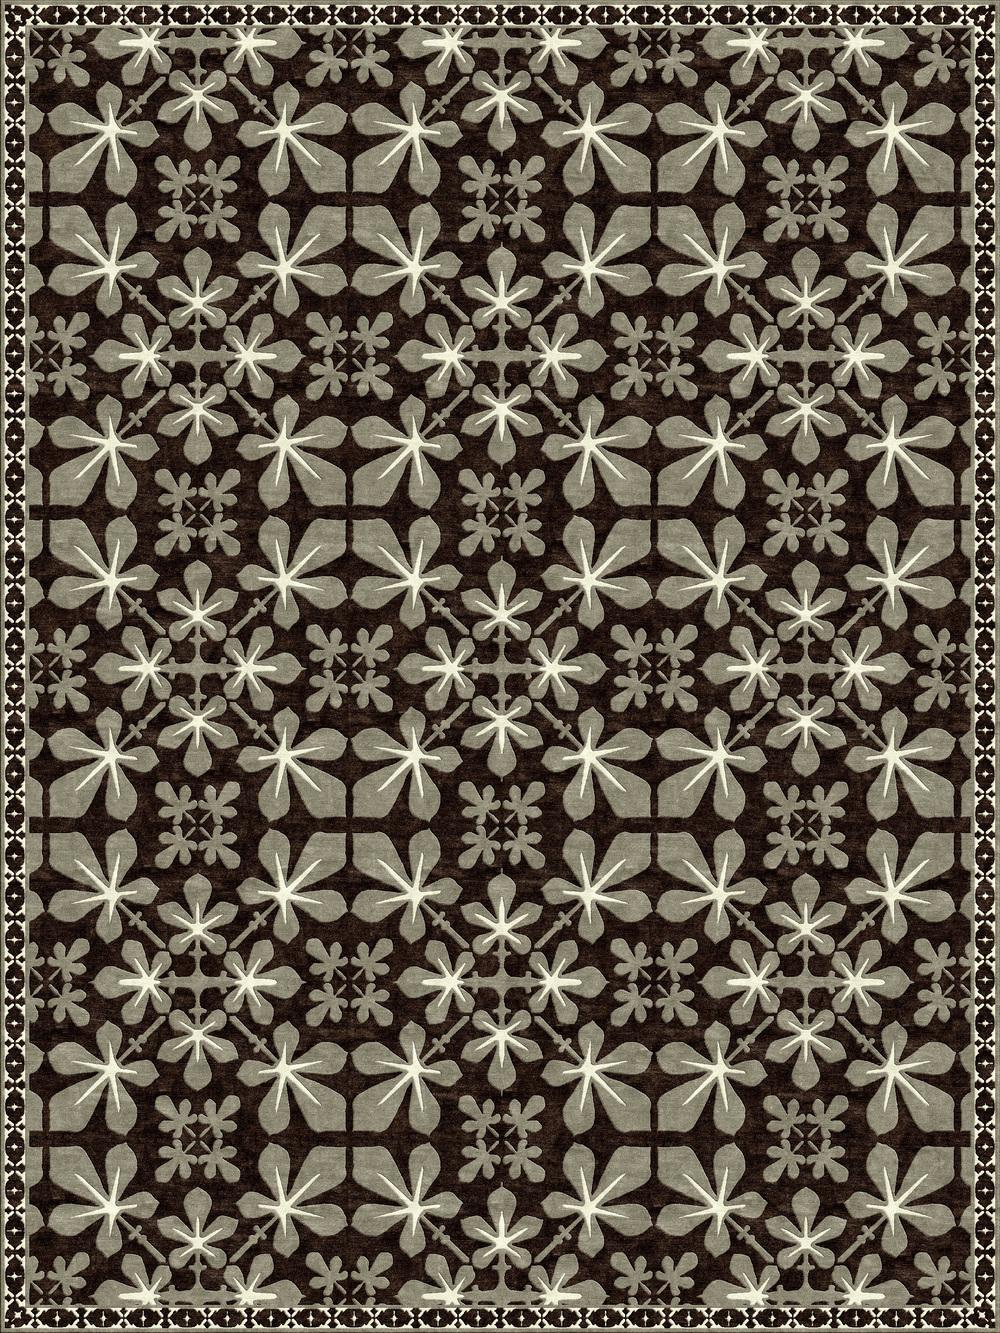 Voodoodoo 9x12 300dpi.jpg